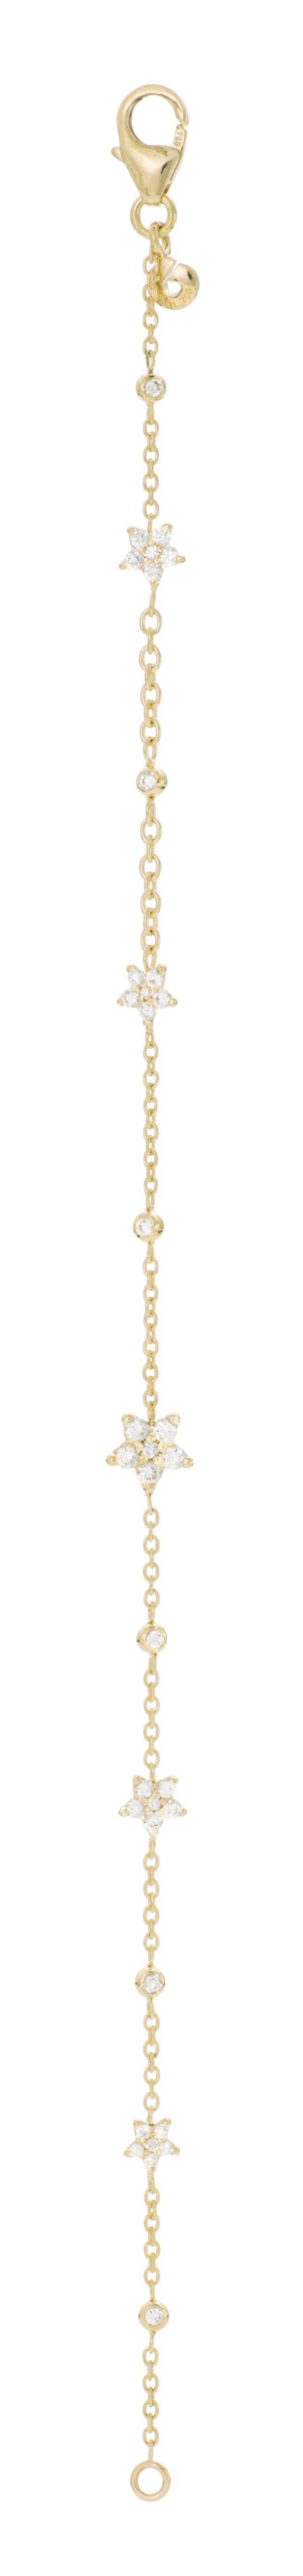 Ole Lynggaard Copenhagen Bracelets  Shooting StarShooting Star Bracelet